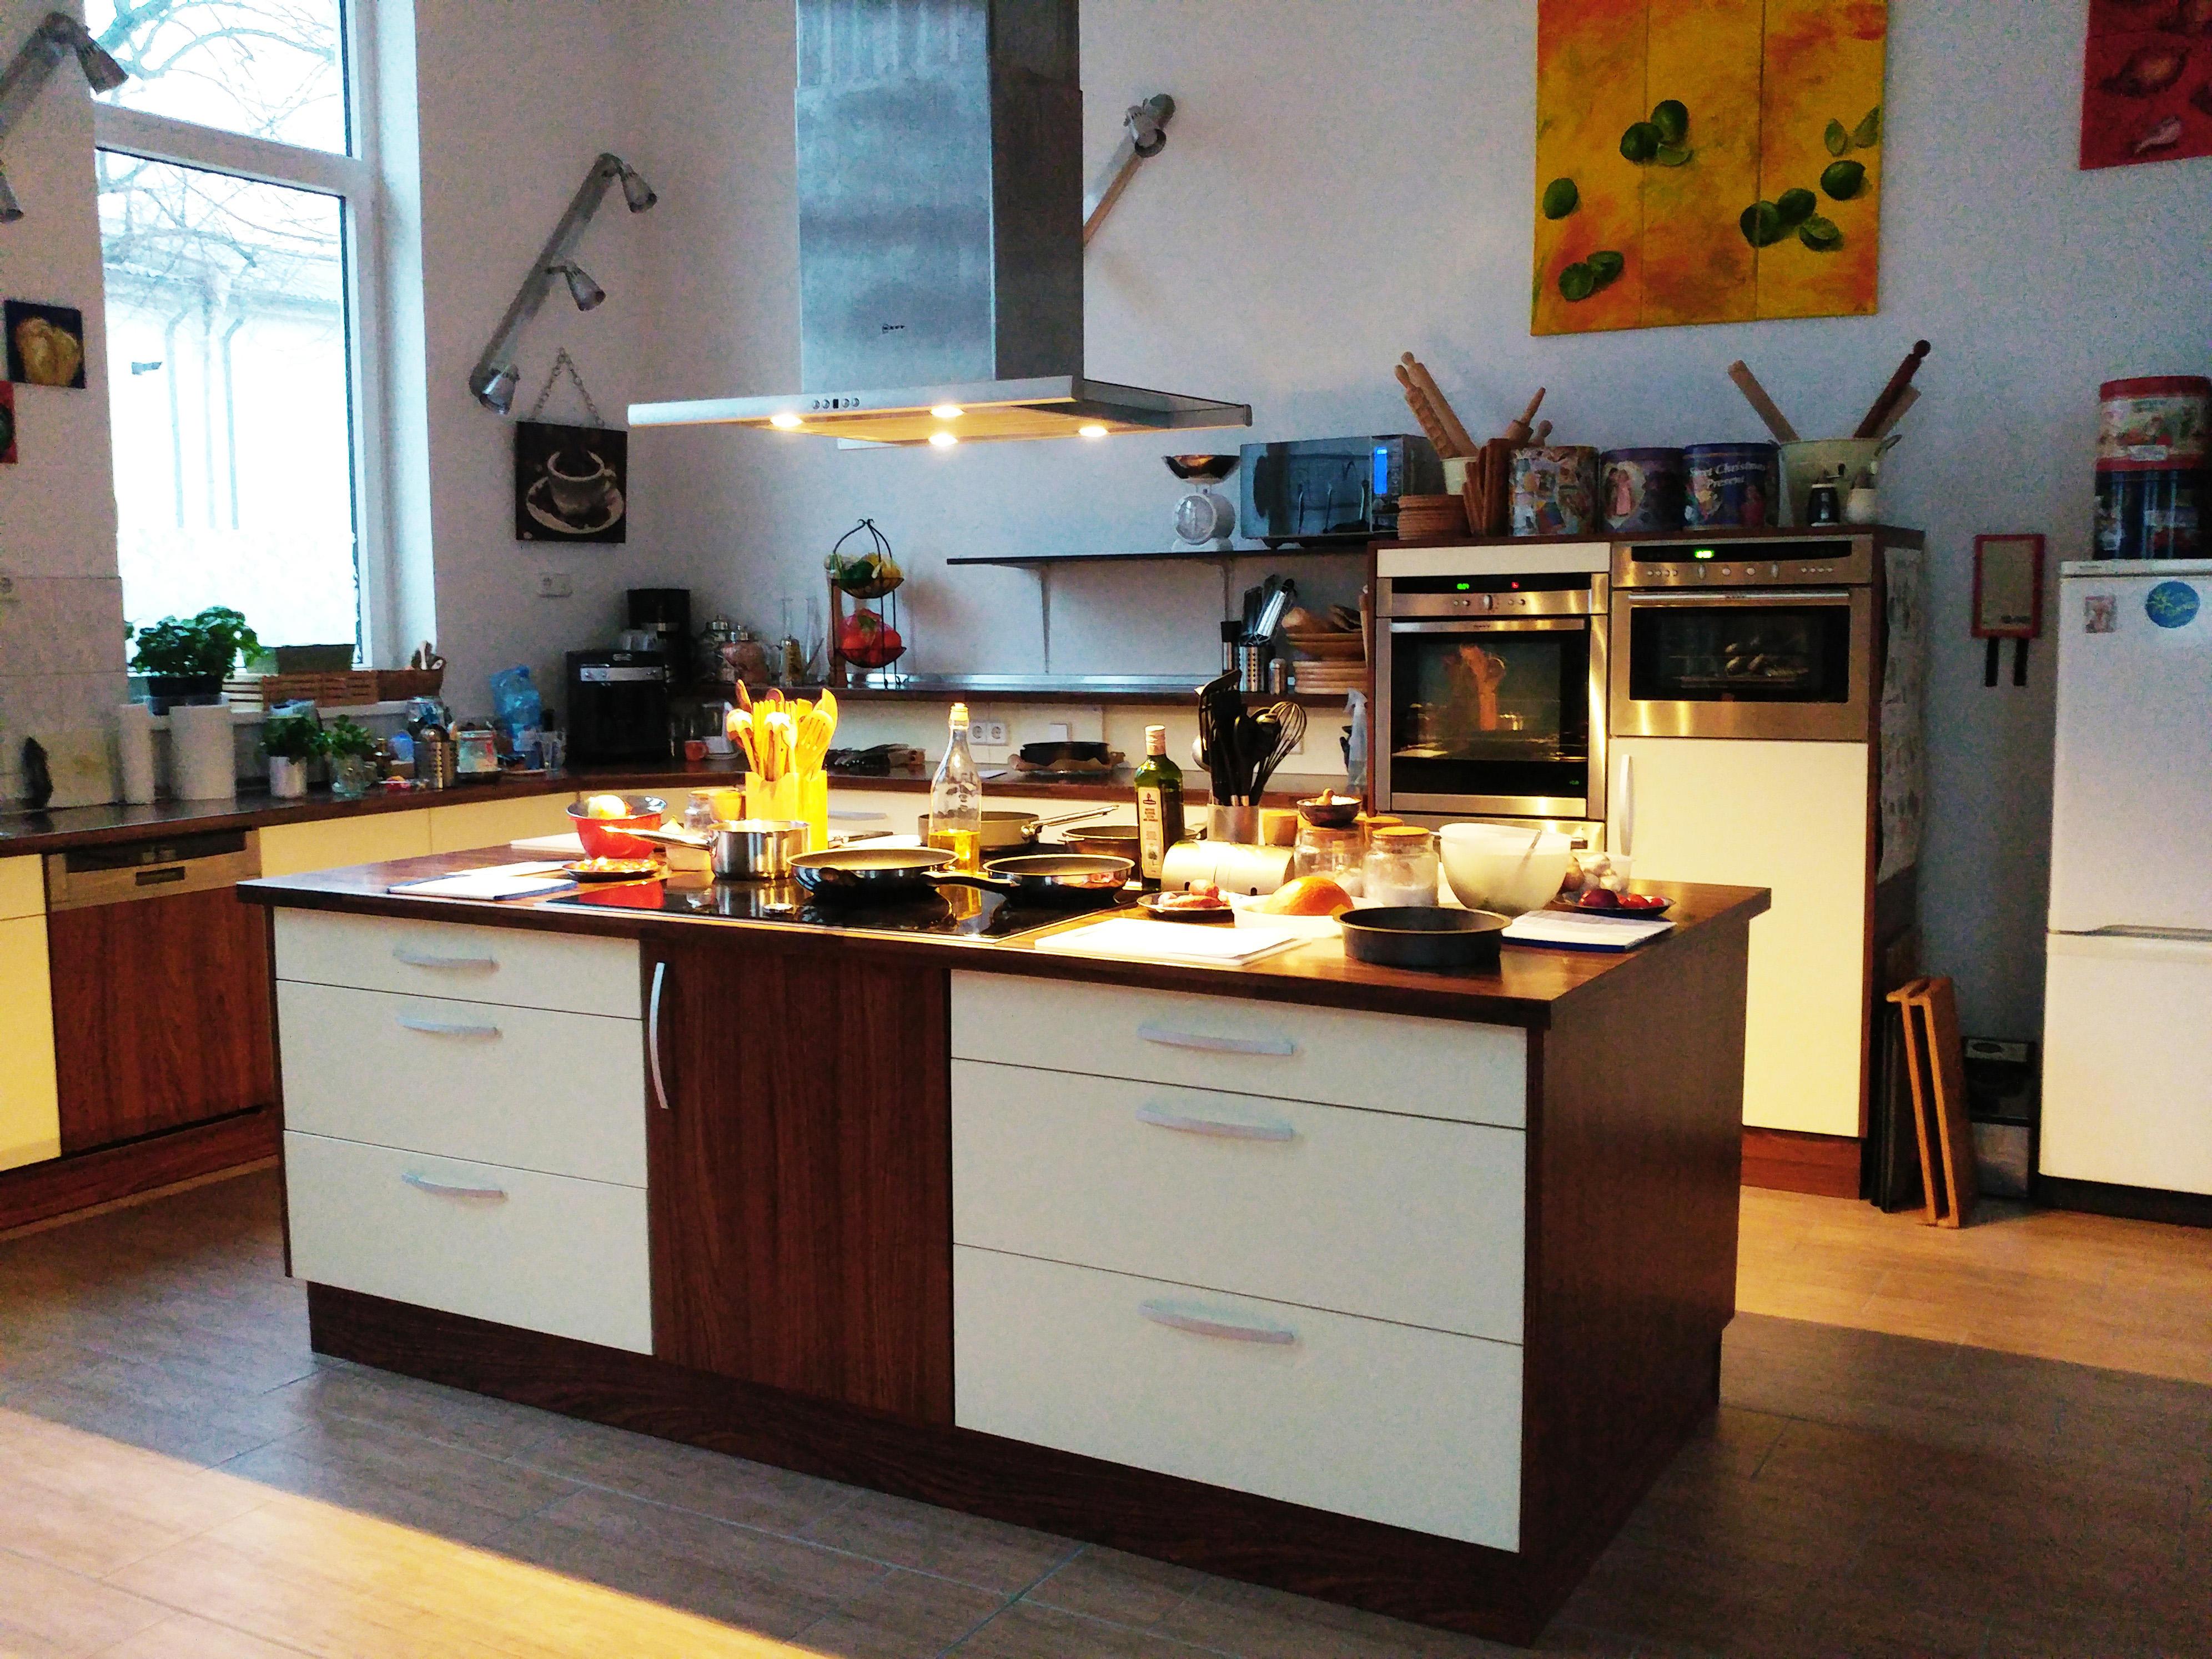 Foto de cookingberlin Kochstudio in Pankow Berlin